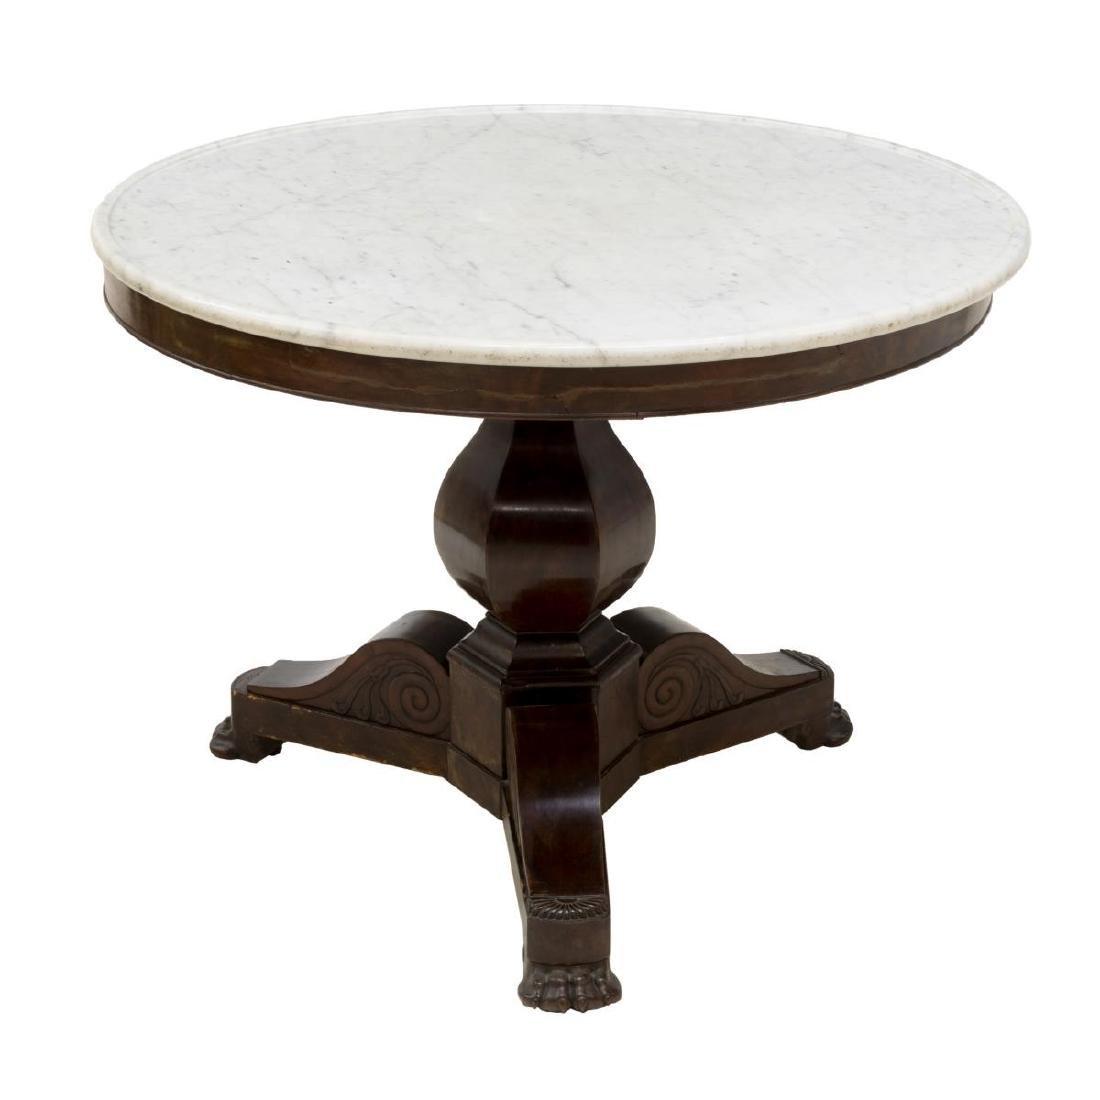 FRENCH EMPIRE STYLE MAHOGANY MARBLE CENTER TABLE